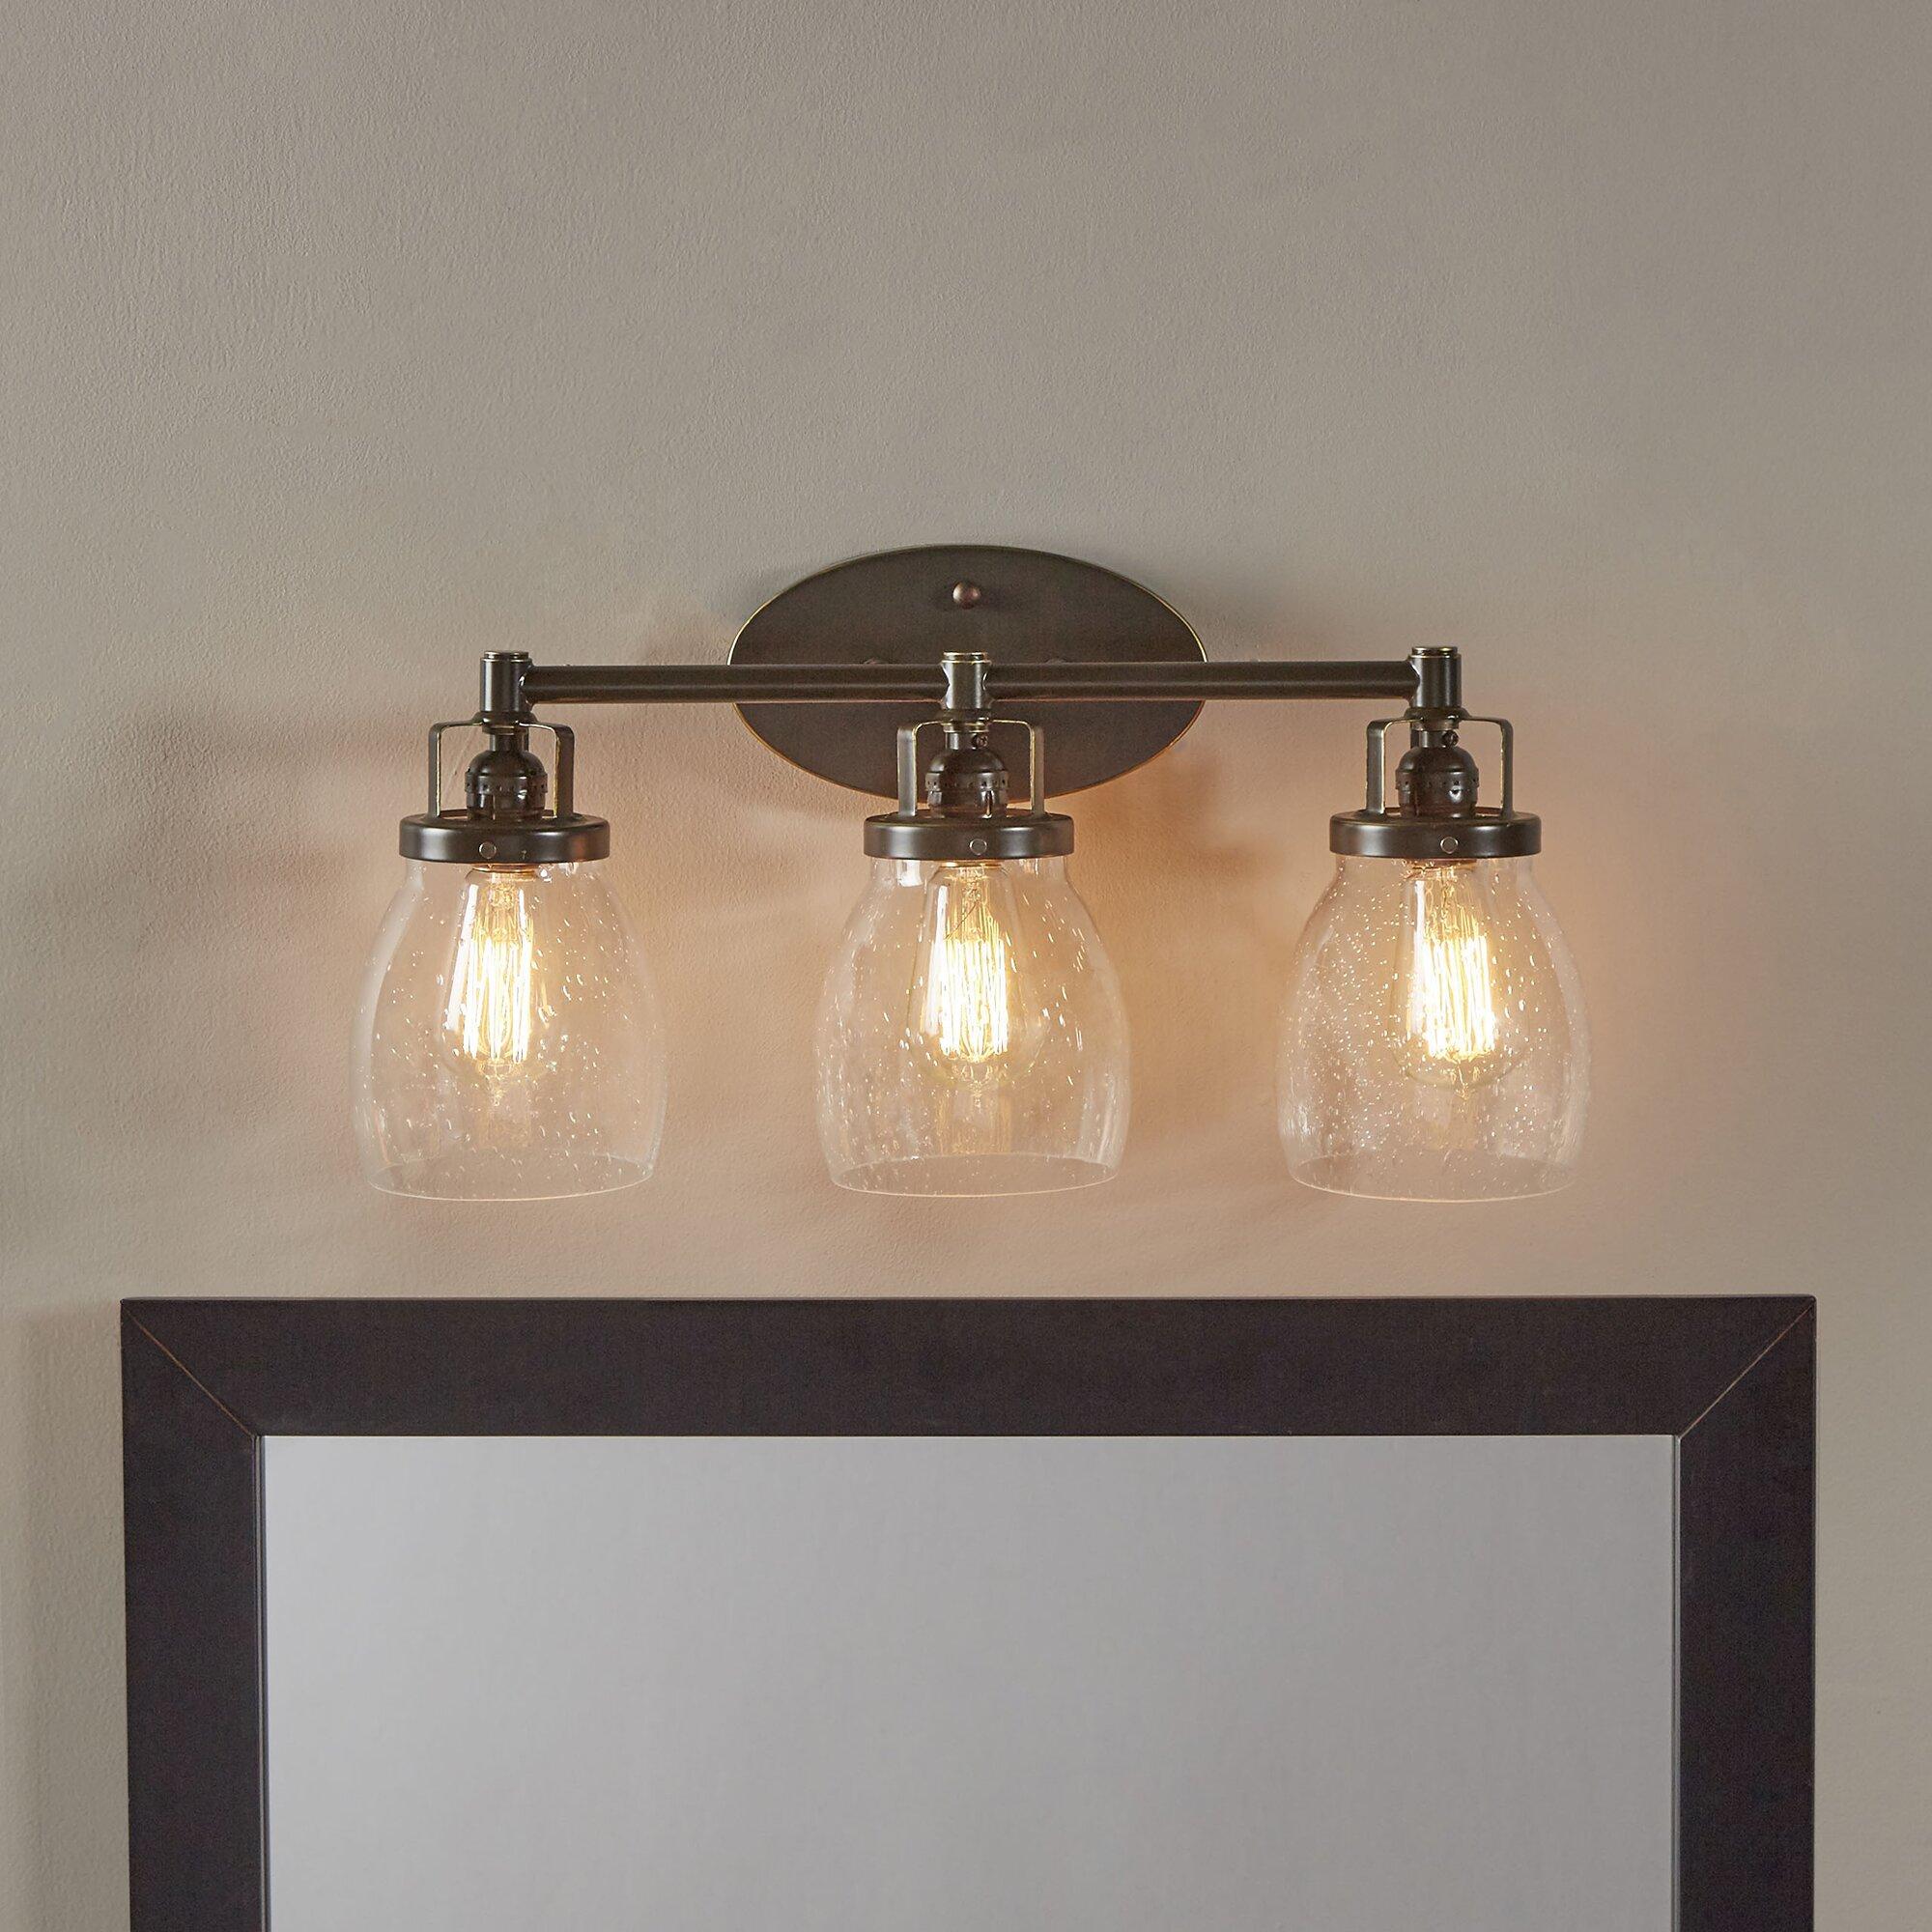 Yesler Heirloom Bronze 3-Light Vanity Light & Reviews